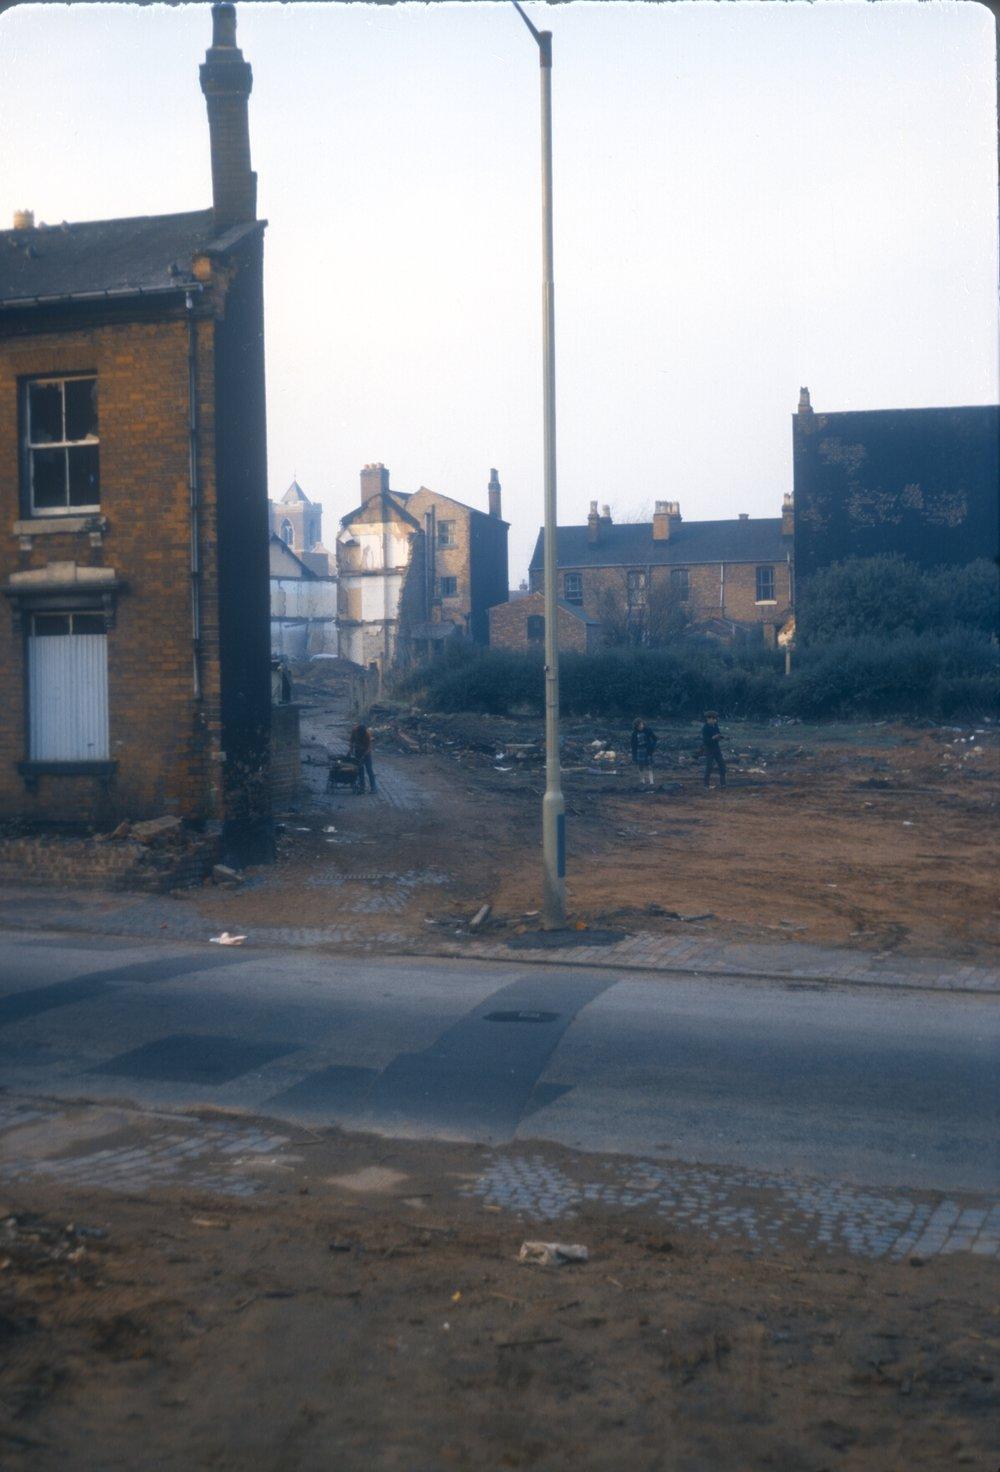 Newtown, Furnace Lane. North of Gerrard Street, South of Gower Street. 9th November 1968